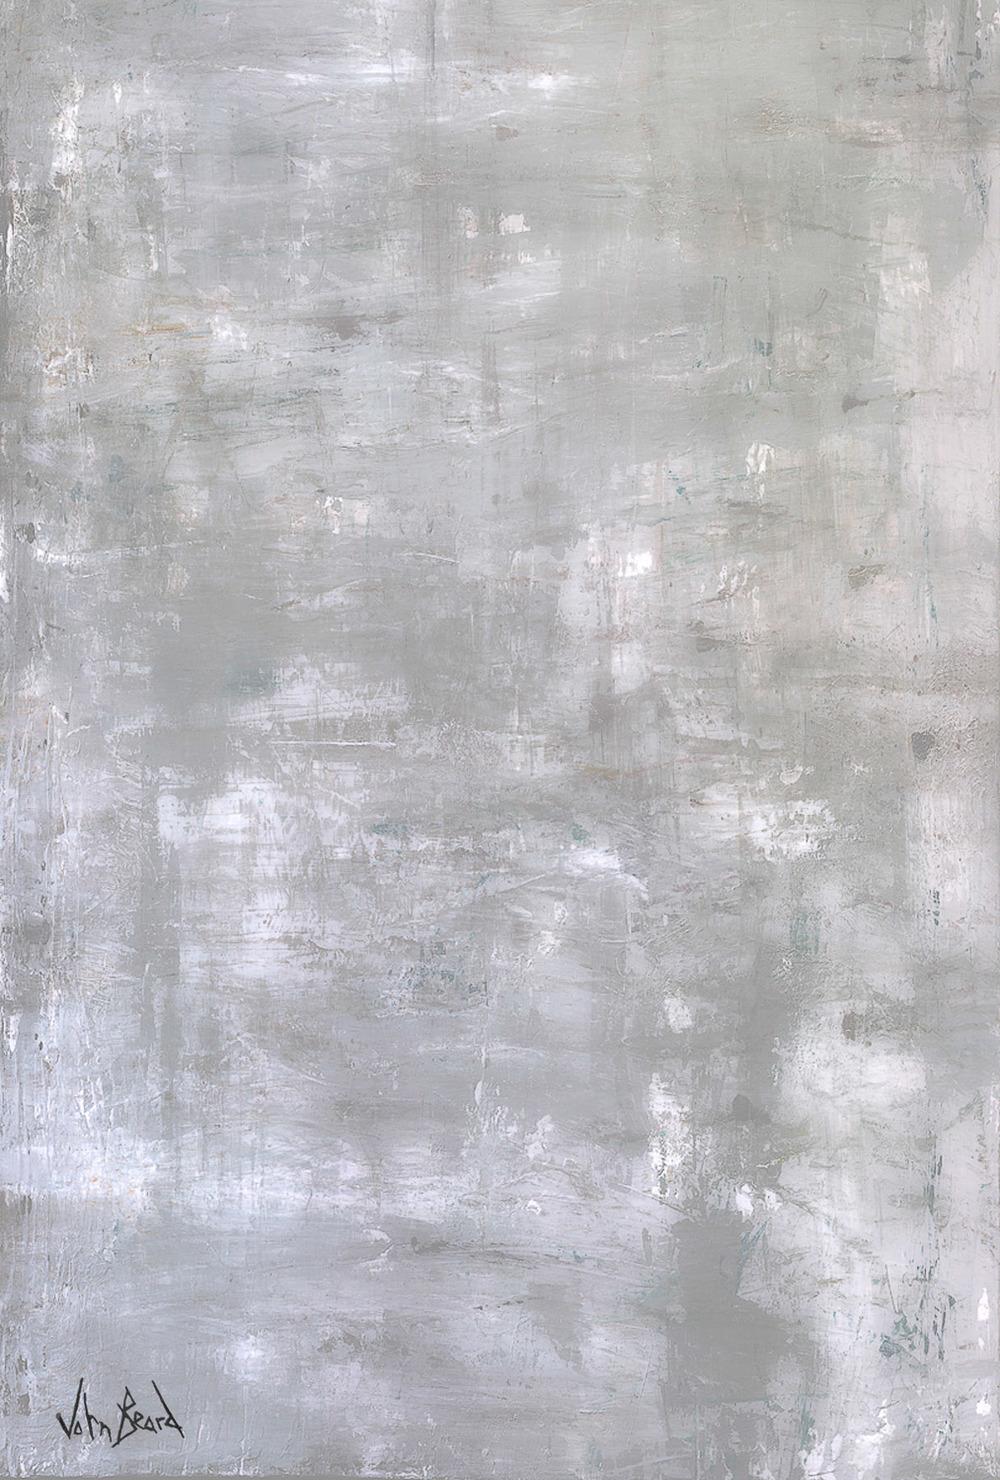 White On Grey II by John Beard.jpg